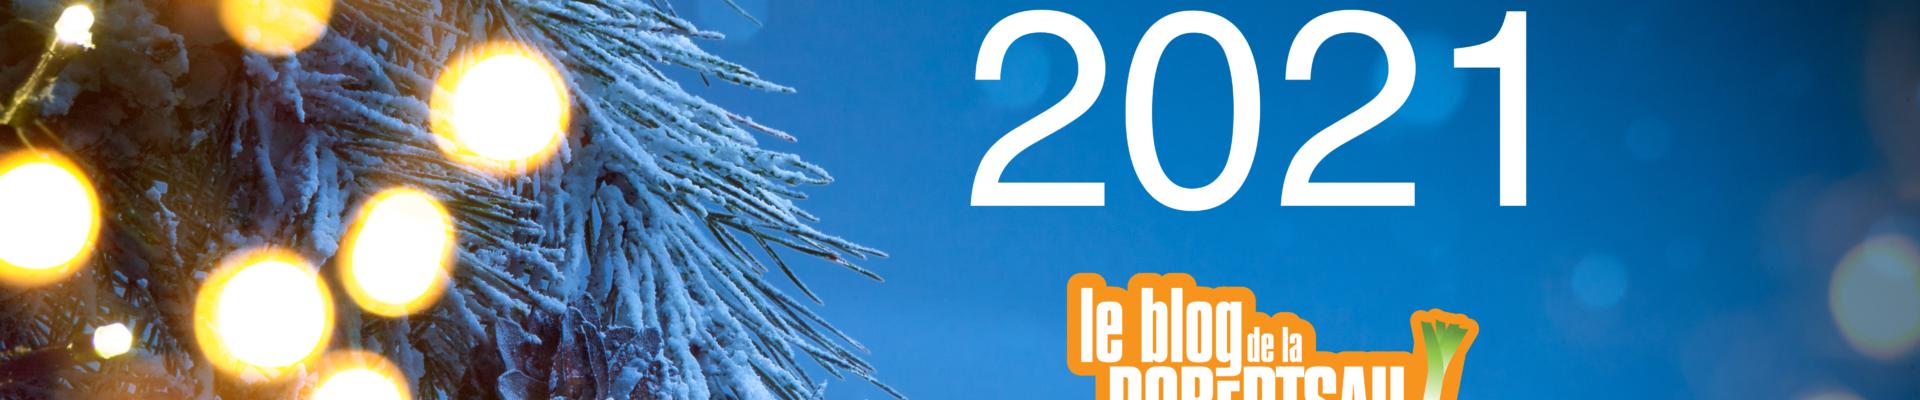 Bon an, mal an… bonne année !